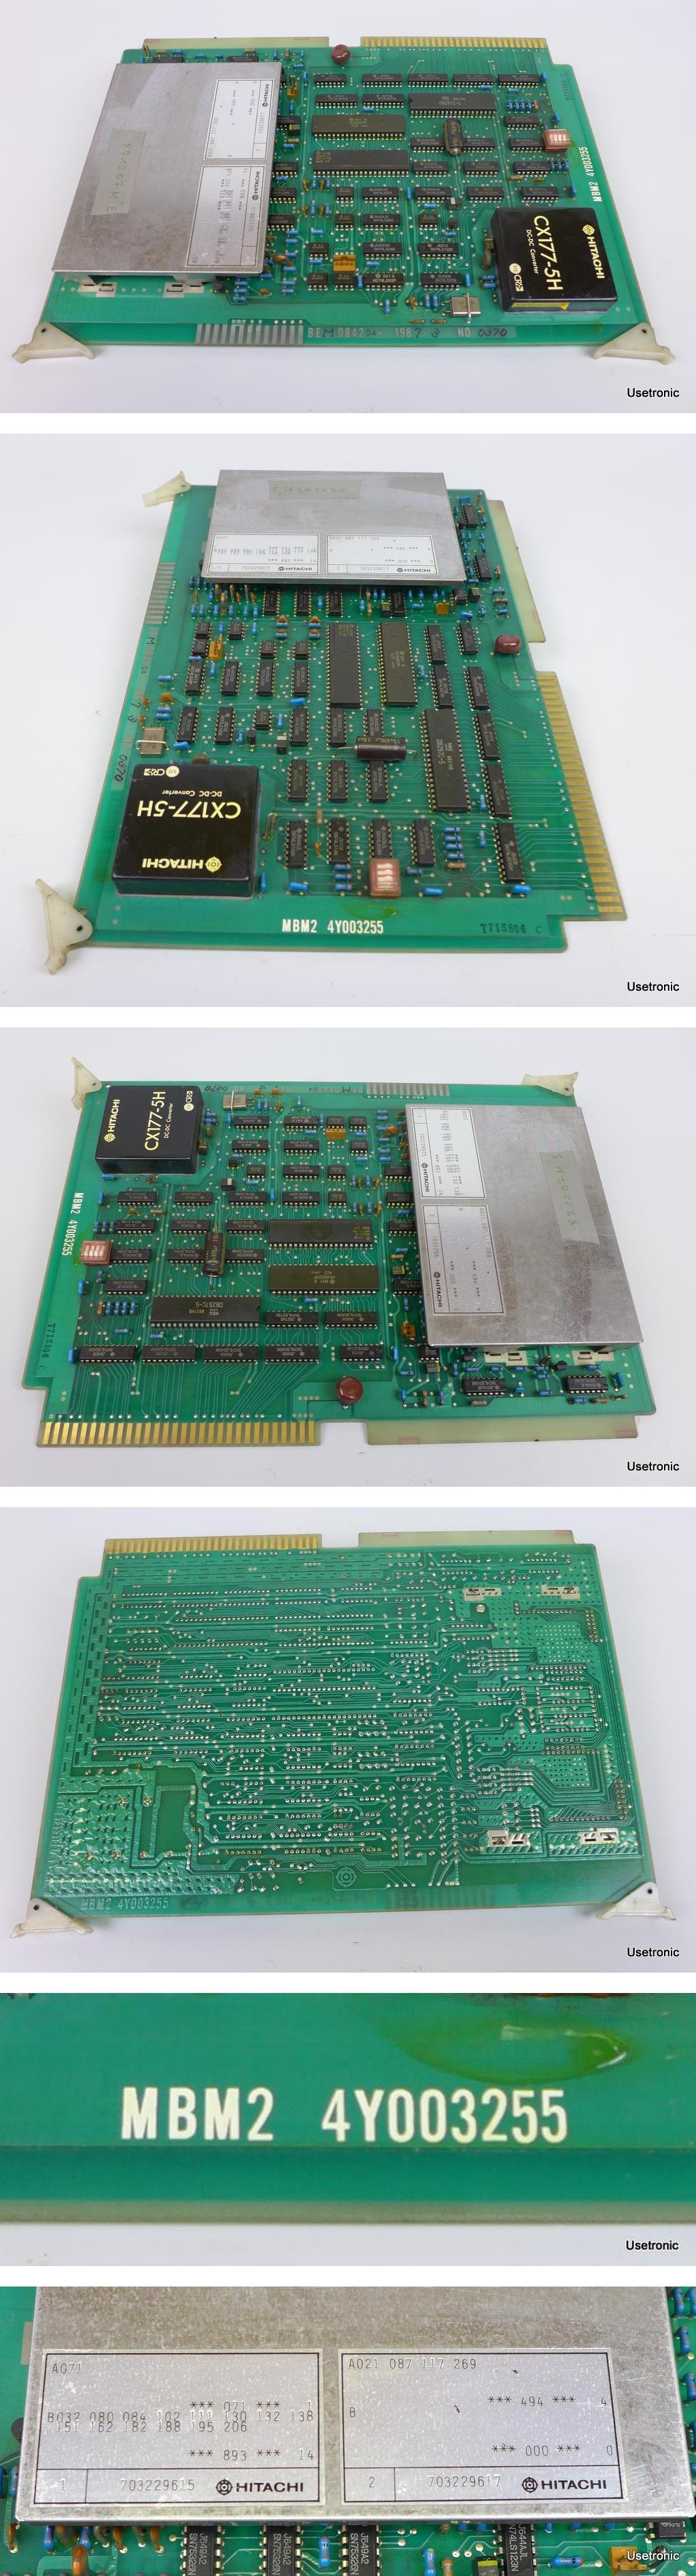 Hitachi MBM2 4Y003255